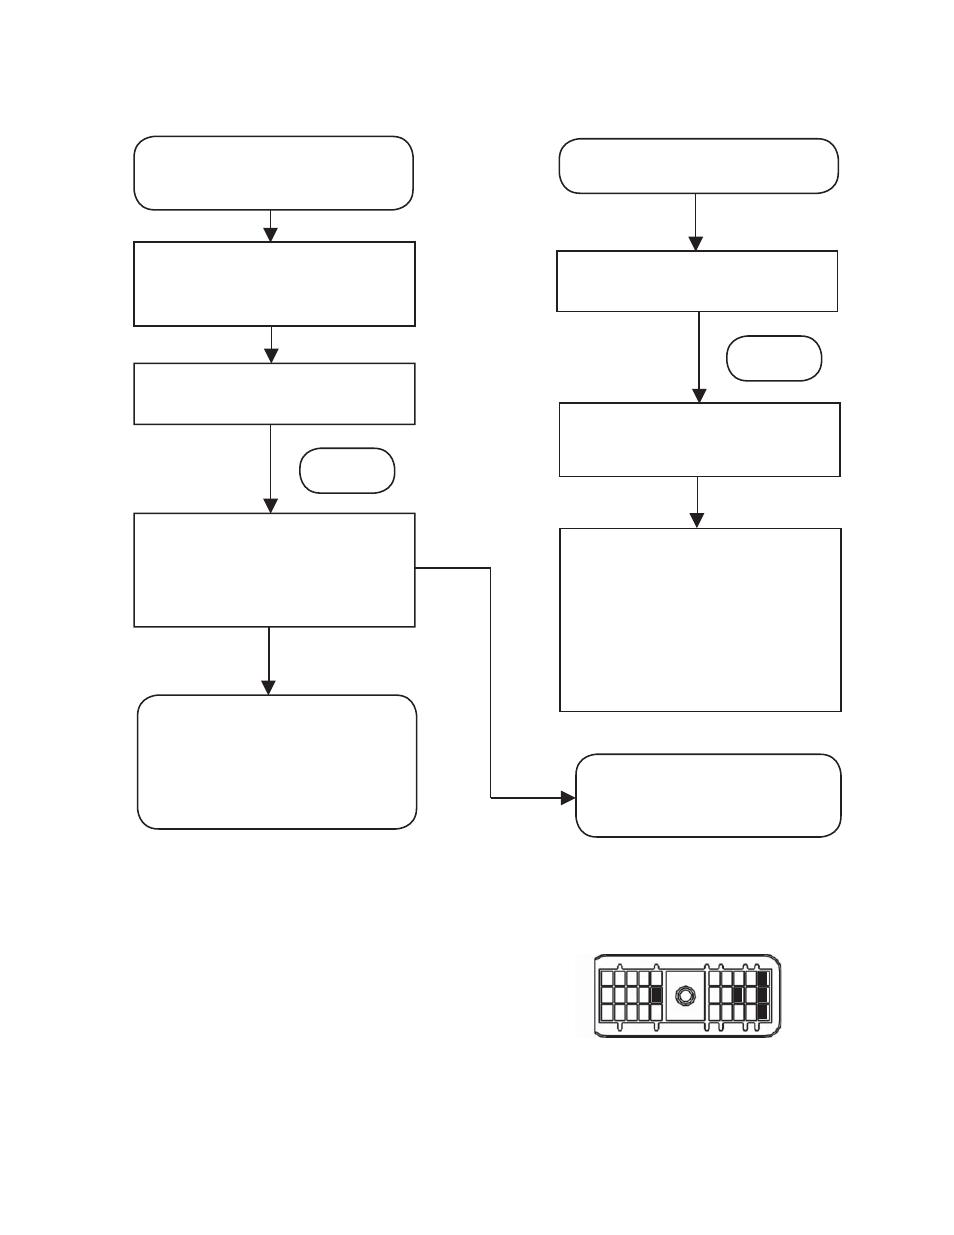 Bendix Ec 30 Wiring Diagram Electrical Diagrams Friedrich Schematic Residential Symbols U2022